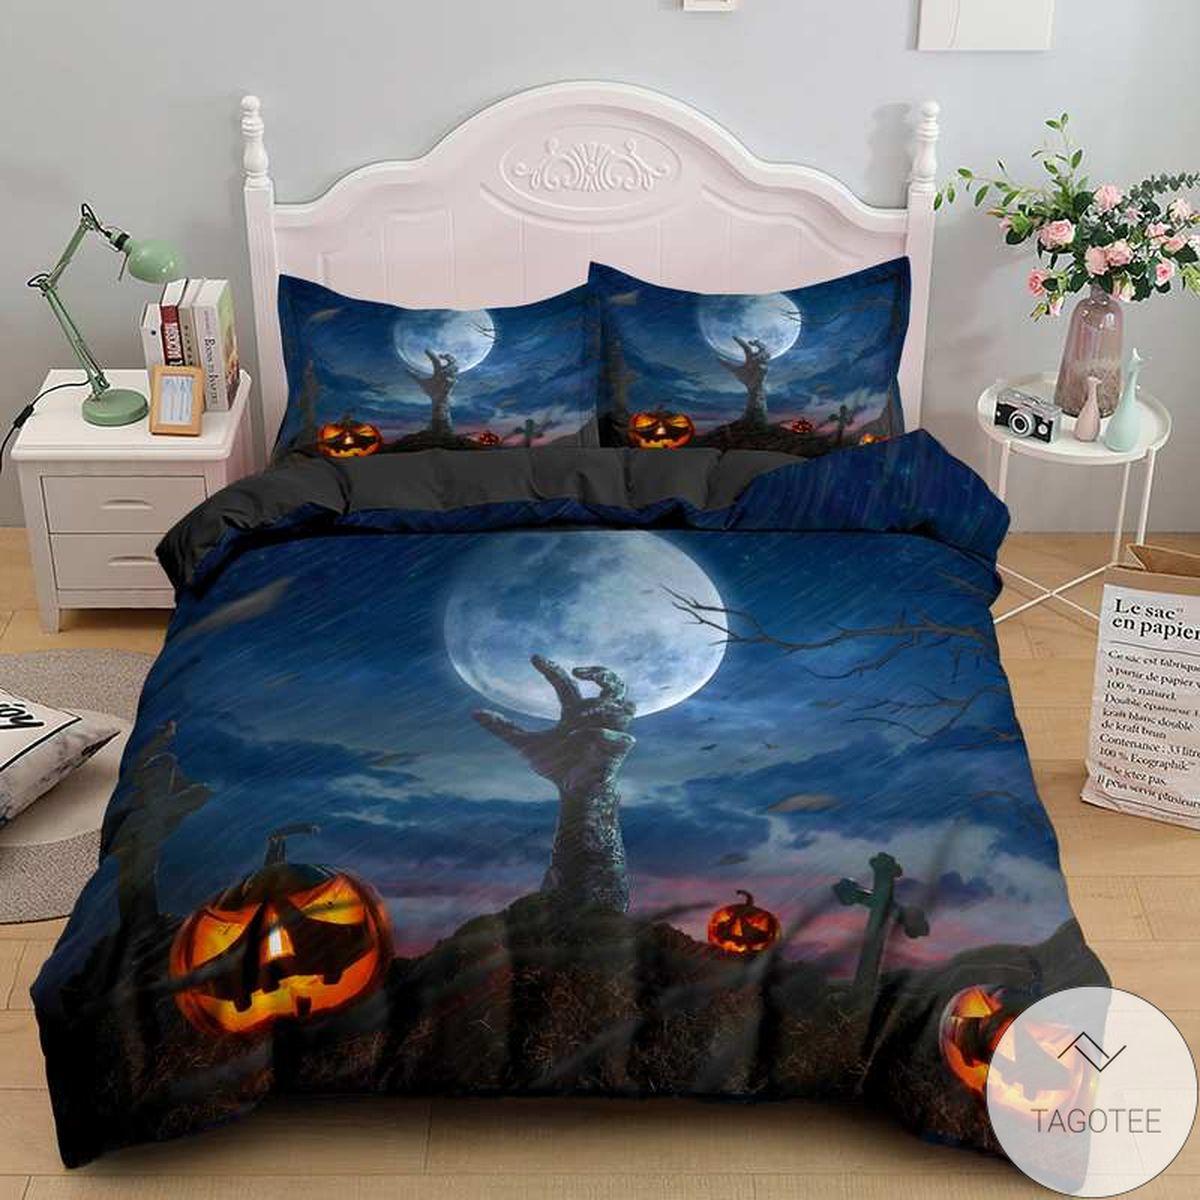 Creepy Halloween Bedding Set